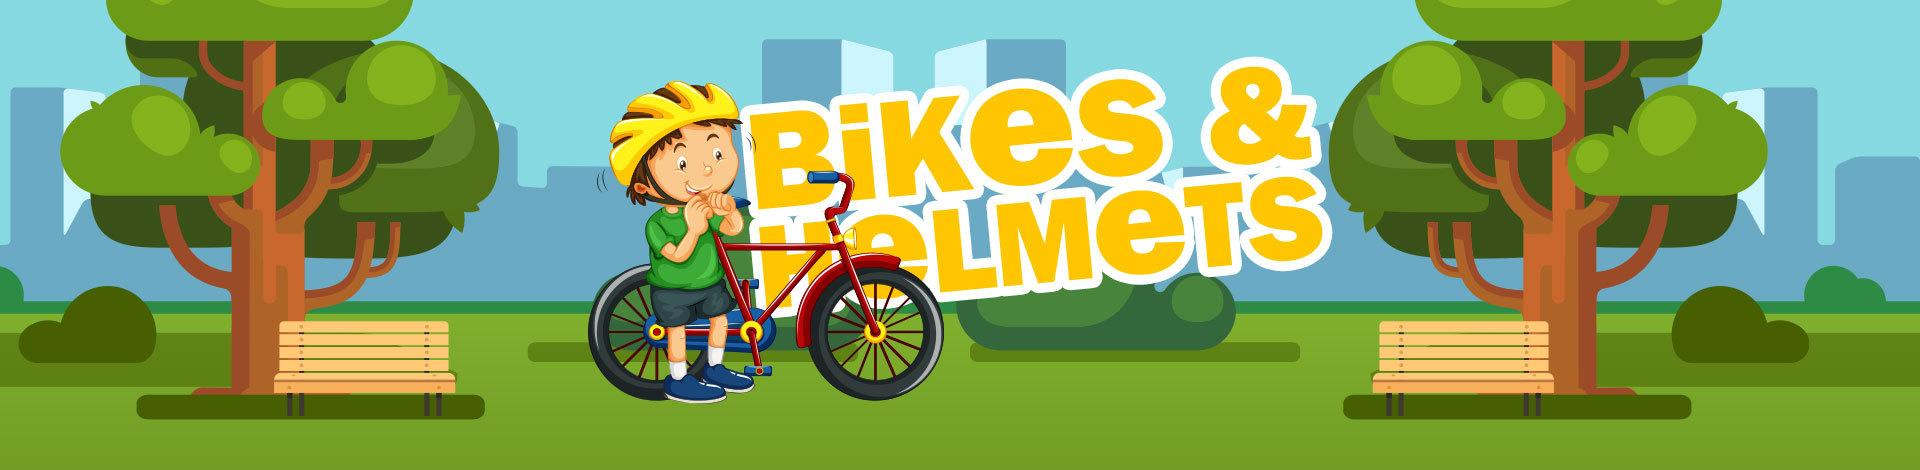 Bikes And Helmets